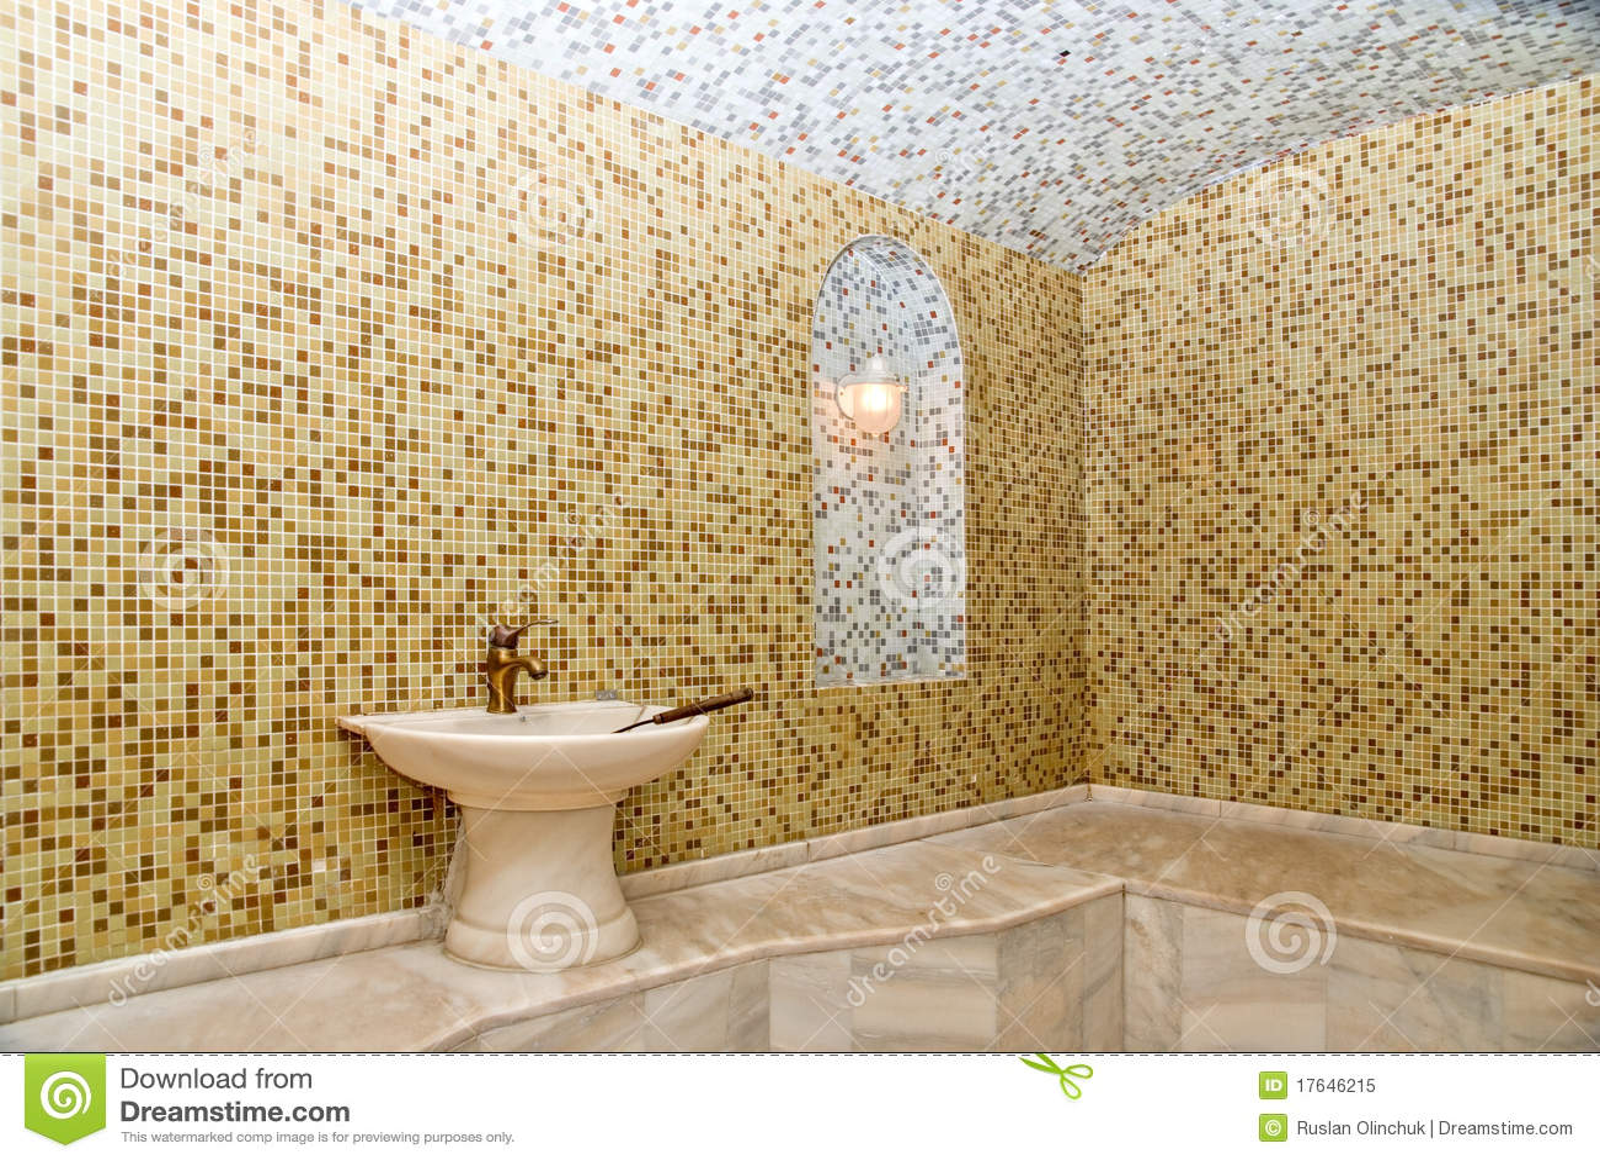 bain turc photo libre de droits image 17646215. Black Bedroom Furniture Sets. Home Design Ideas